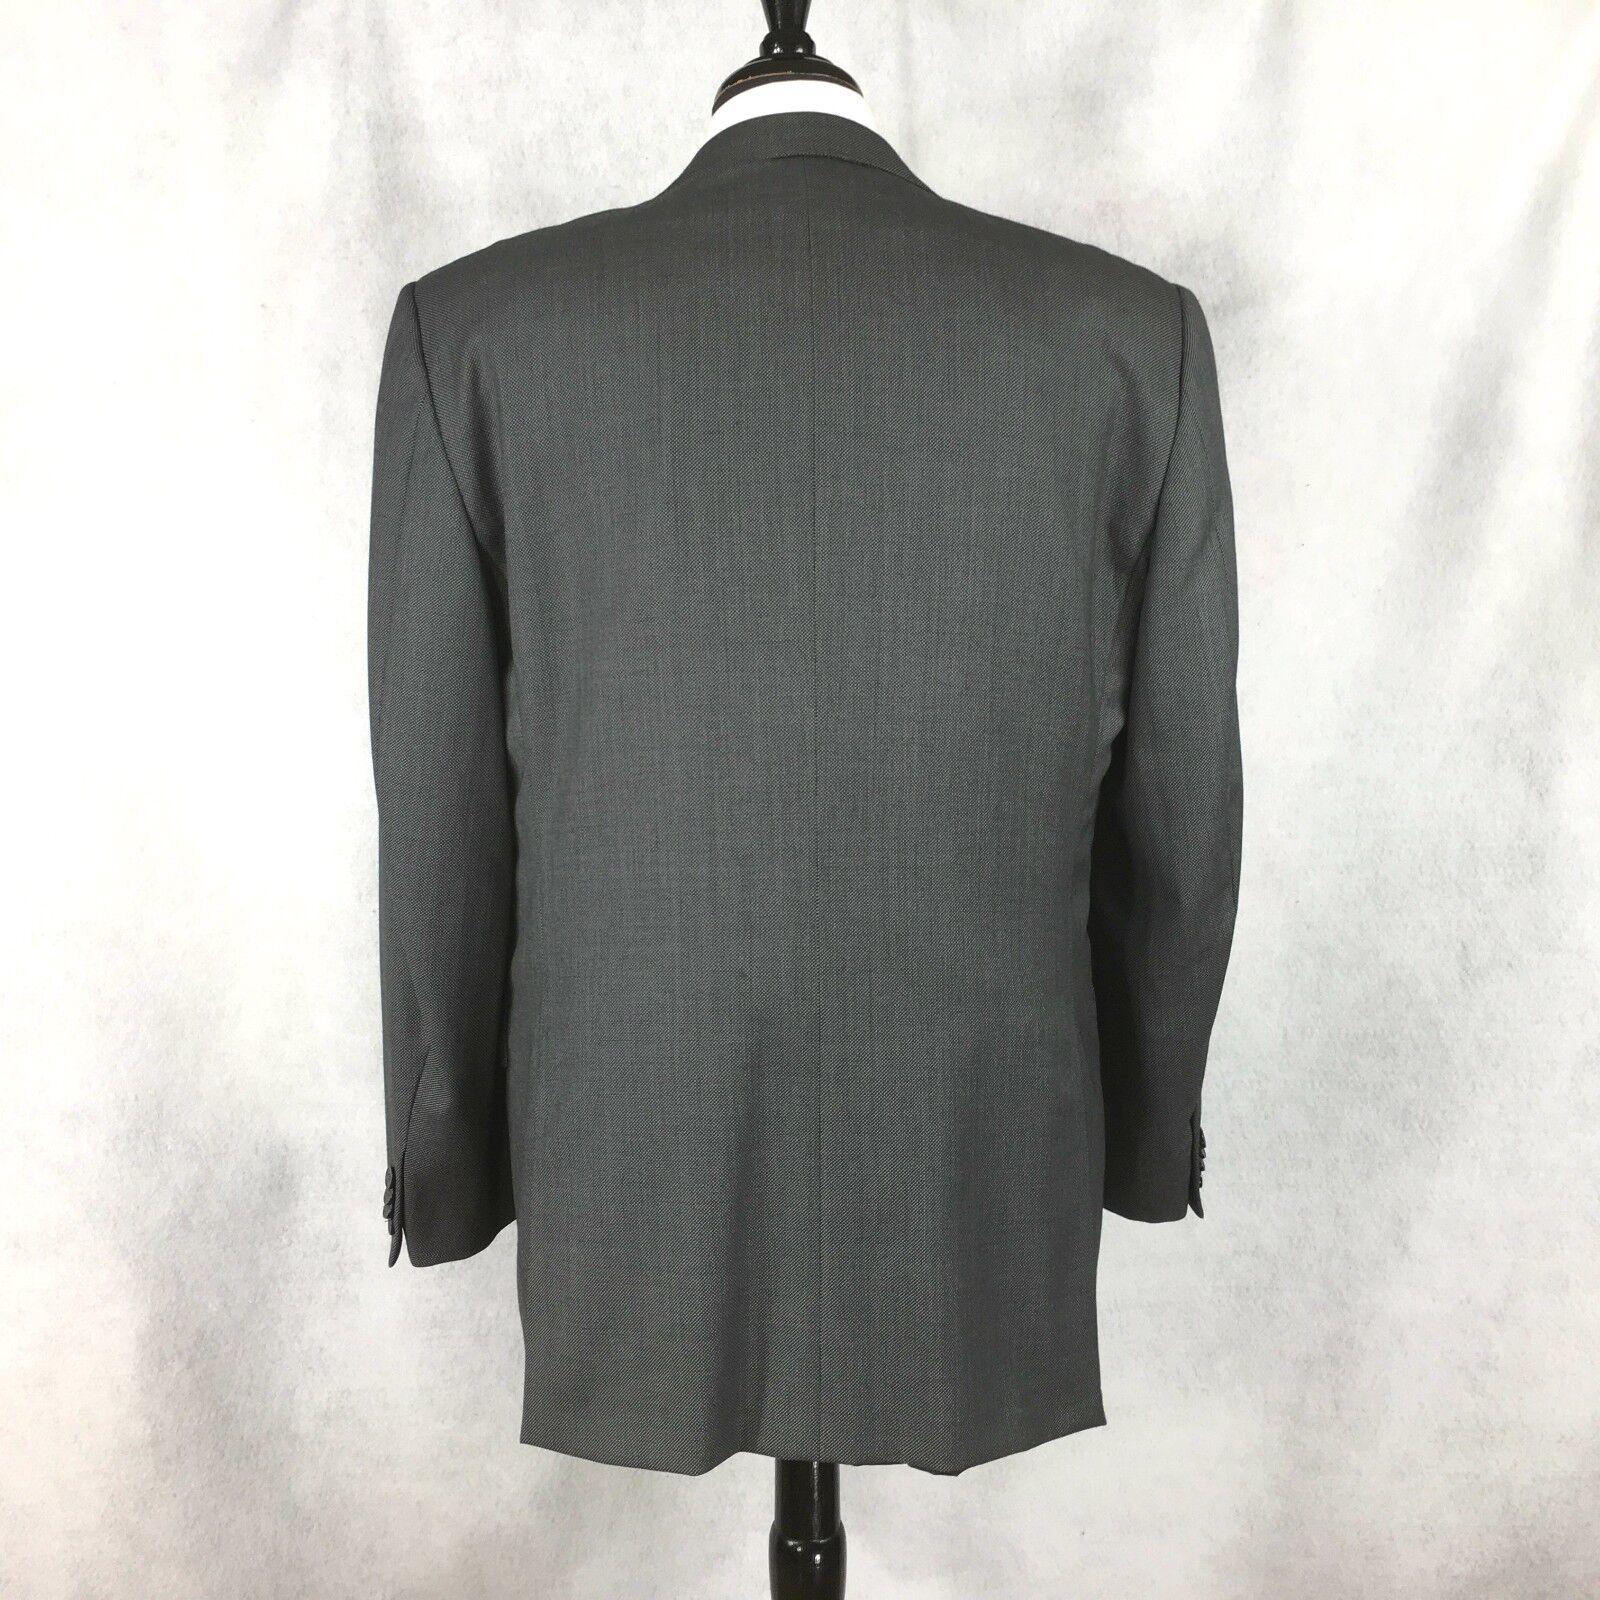 Emenegildo wool Zegna Roma Uomo Gris Birdseye wool Emenegildo Italian blazer US 44R EU 54R 8f0e6b